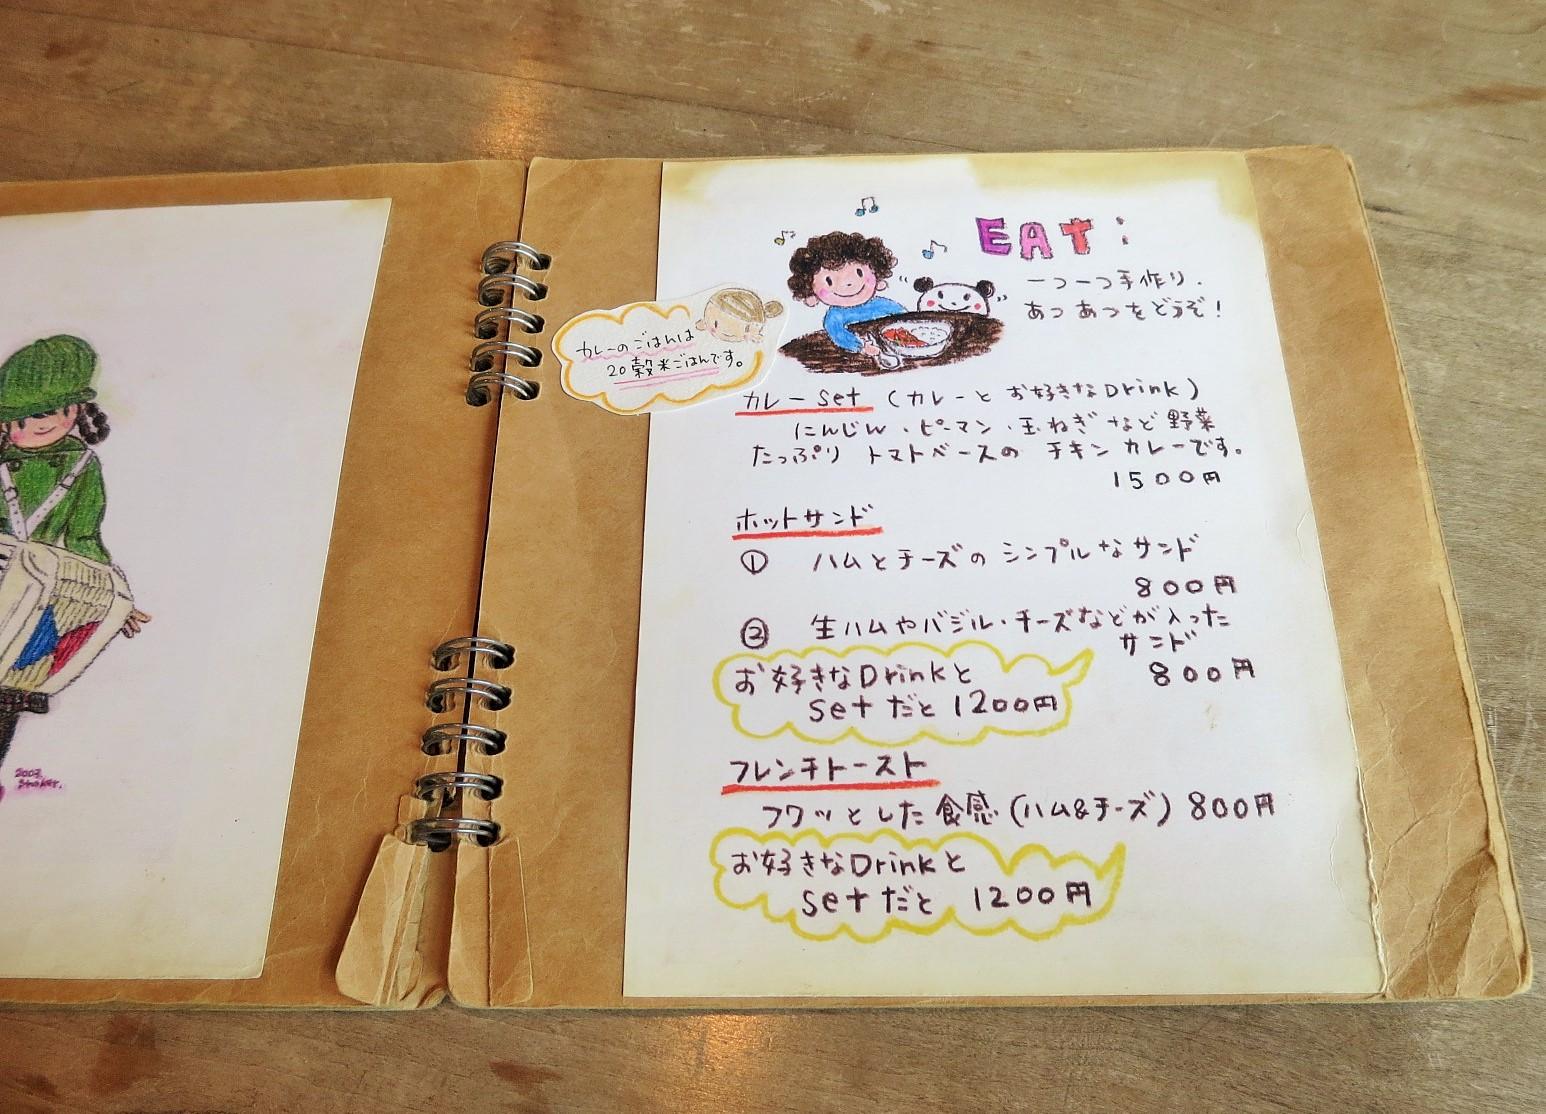 Coffee House Shaker☆裏メニューのフレンチトースト♪_f0236260_2312772.jpg